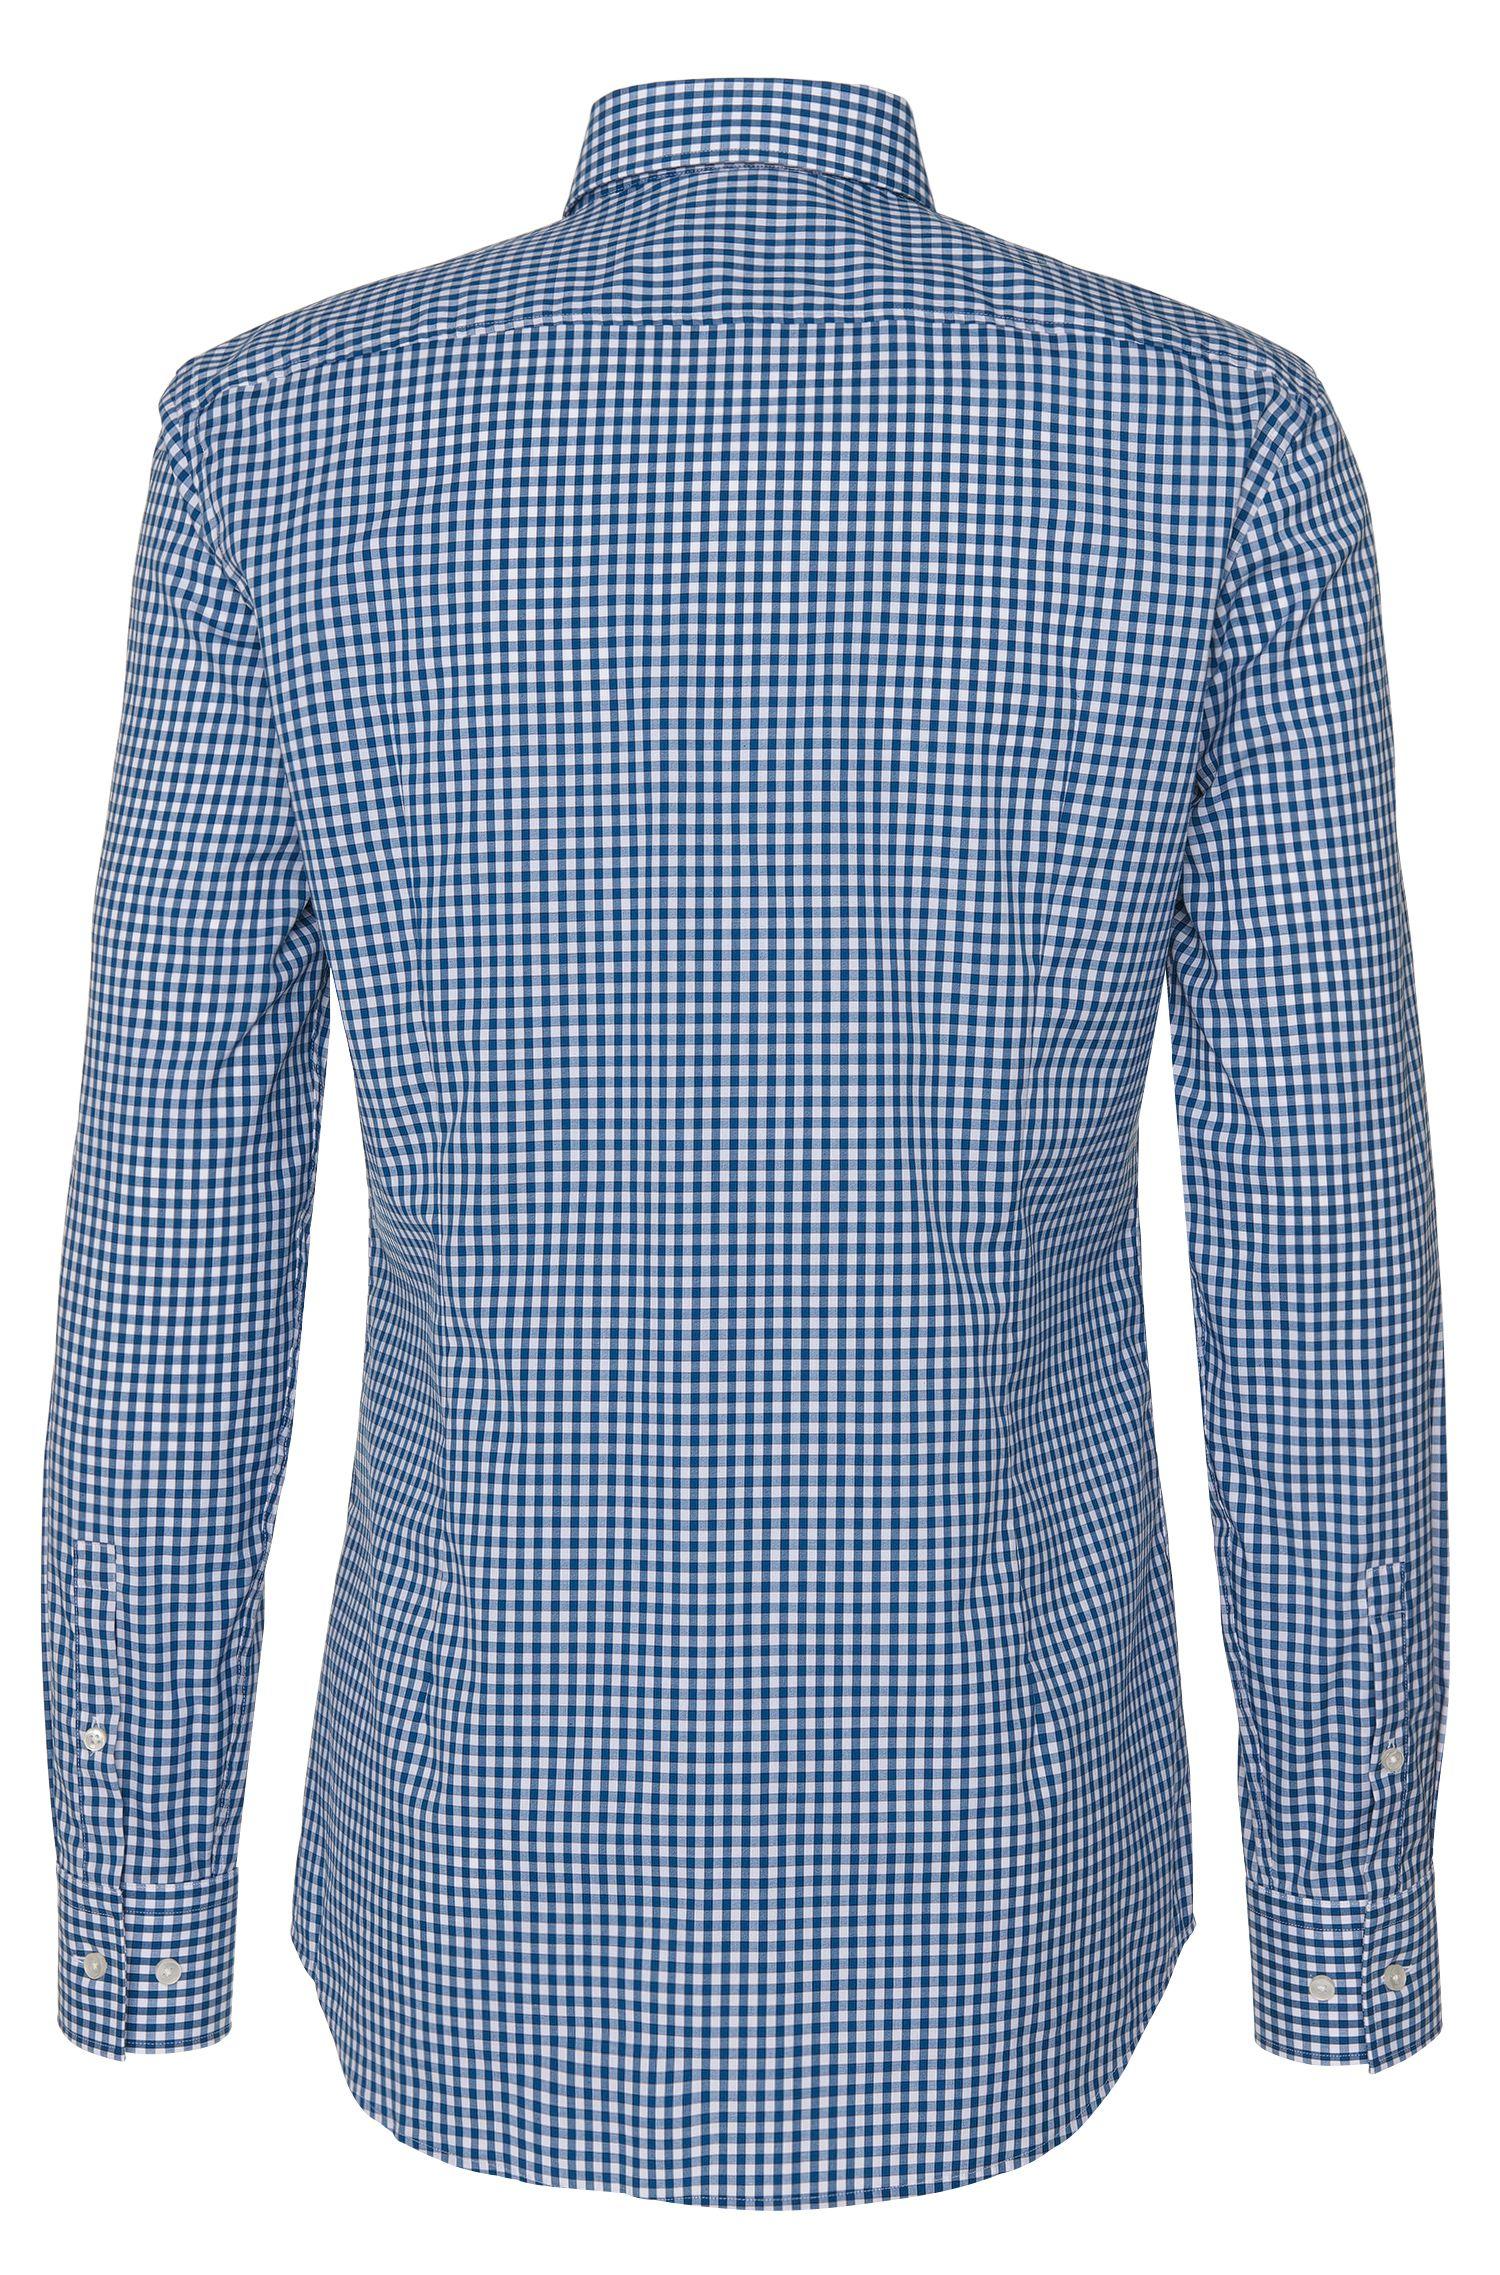 Gingham Cotton Dress Shirt, Slim Fit   Jason